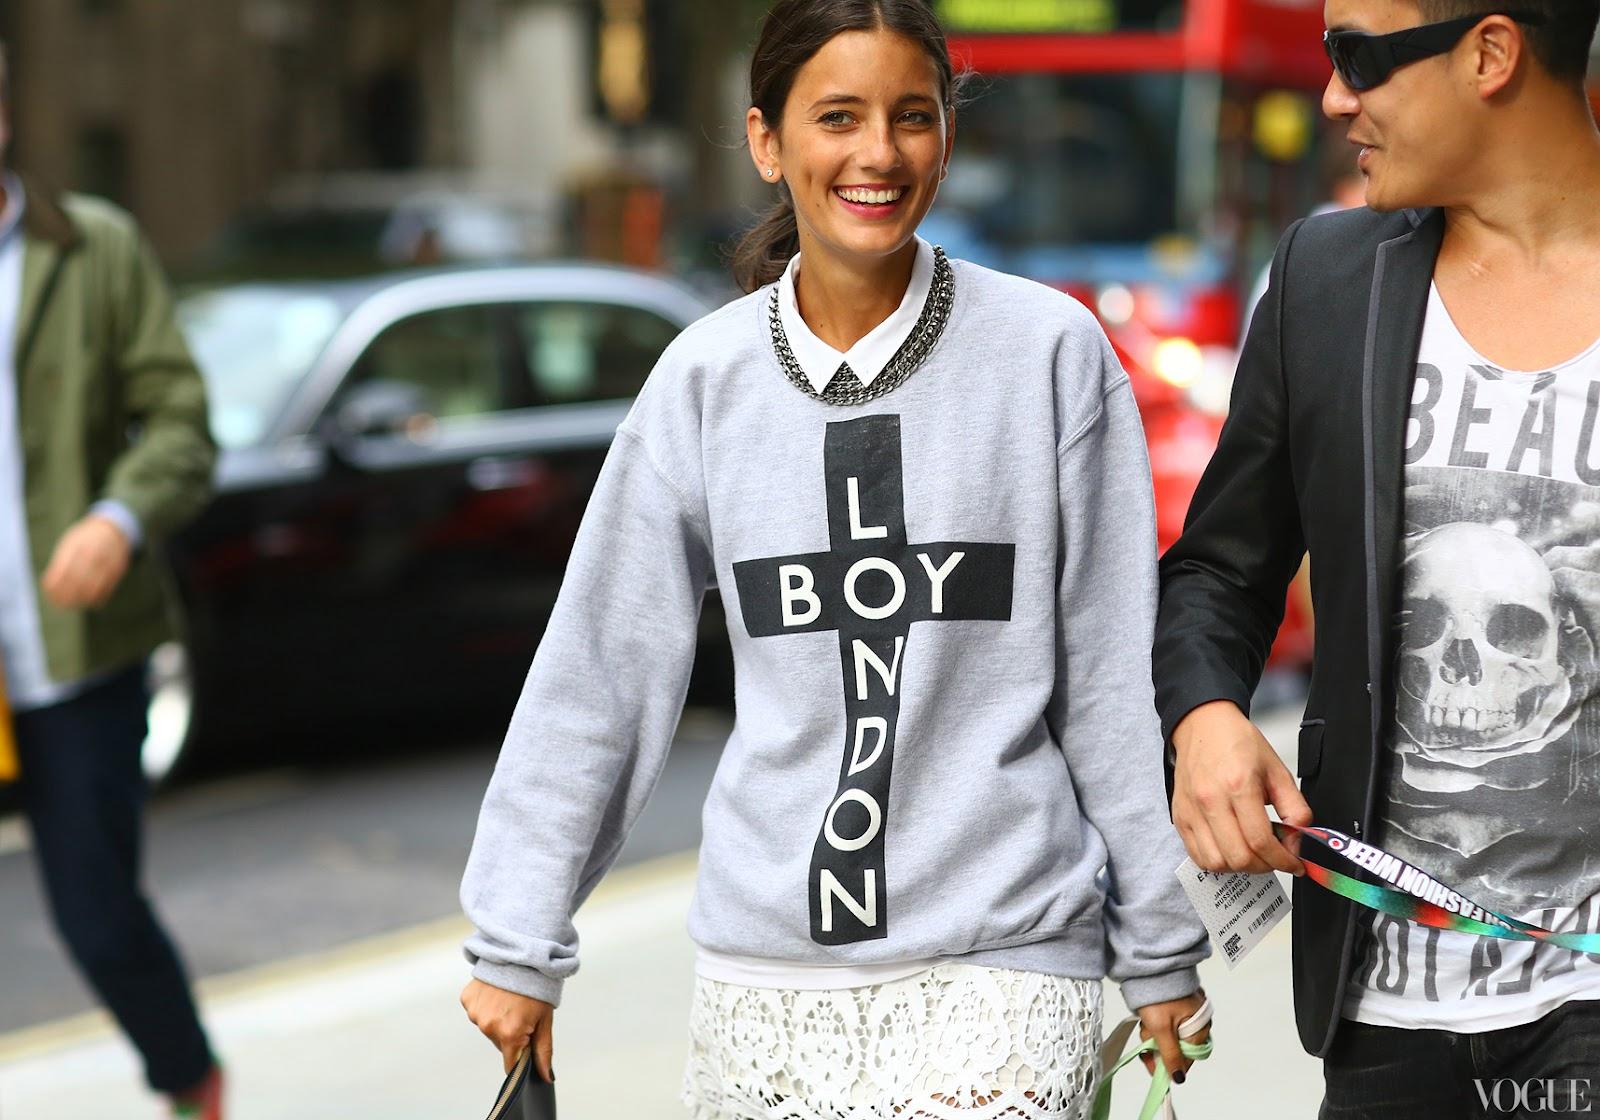 street-style-sweatshirt